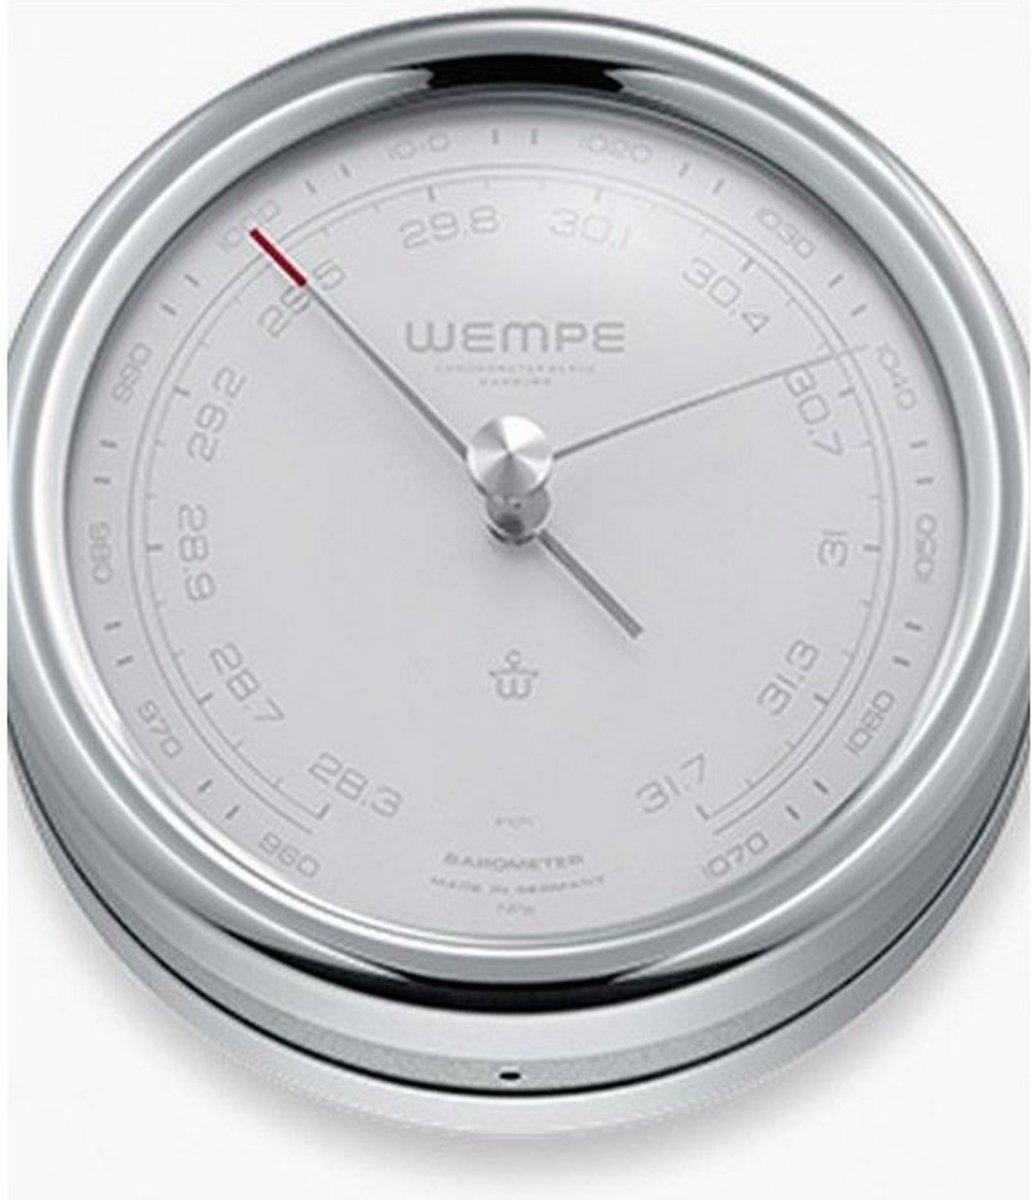 Wempe Chronometerwerke Pilot IV Barometer CW250011 kopen